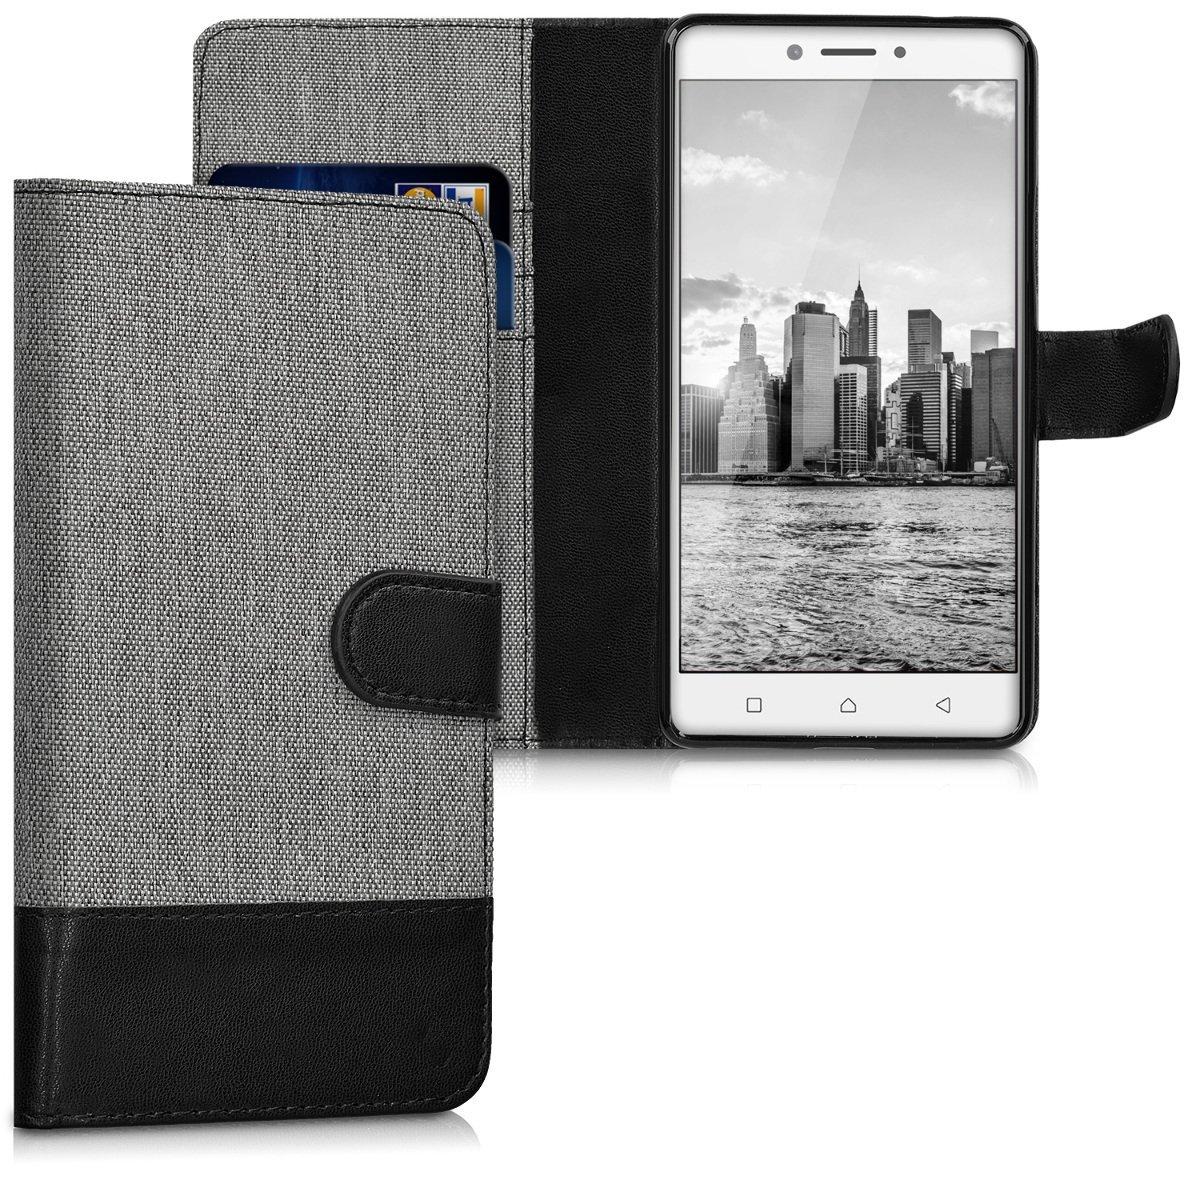 KW Θήκη - Πορτοφόλι Lenovo K6 Note - Grey/ Black (40498.01) θήκες κινητών